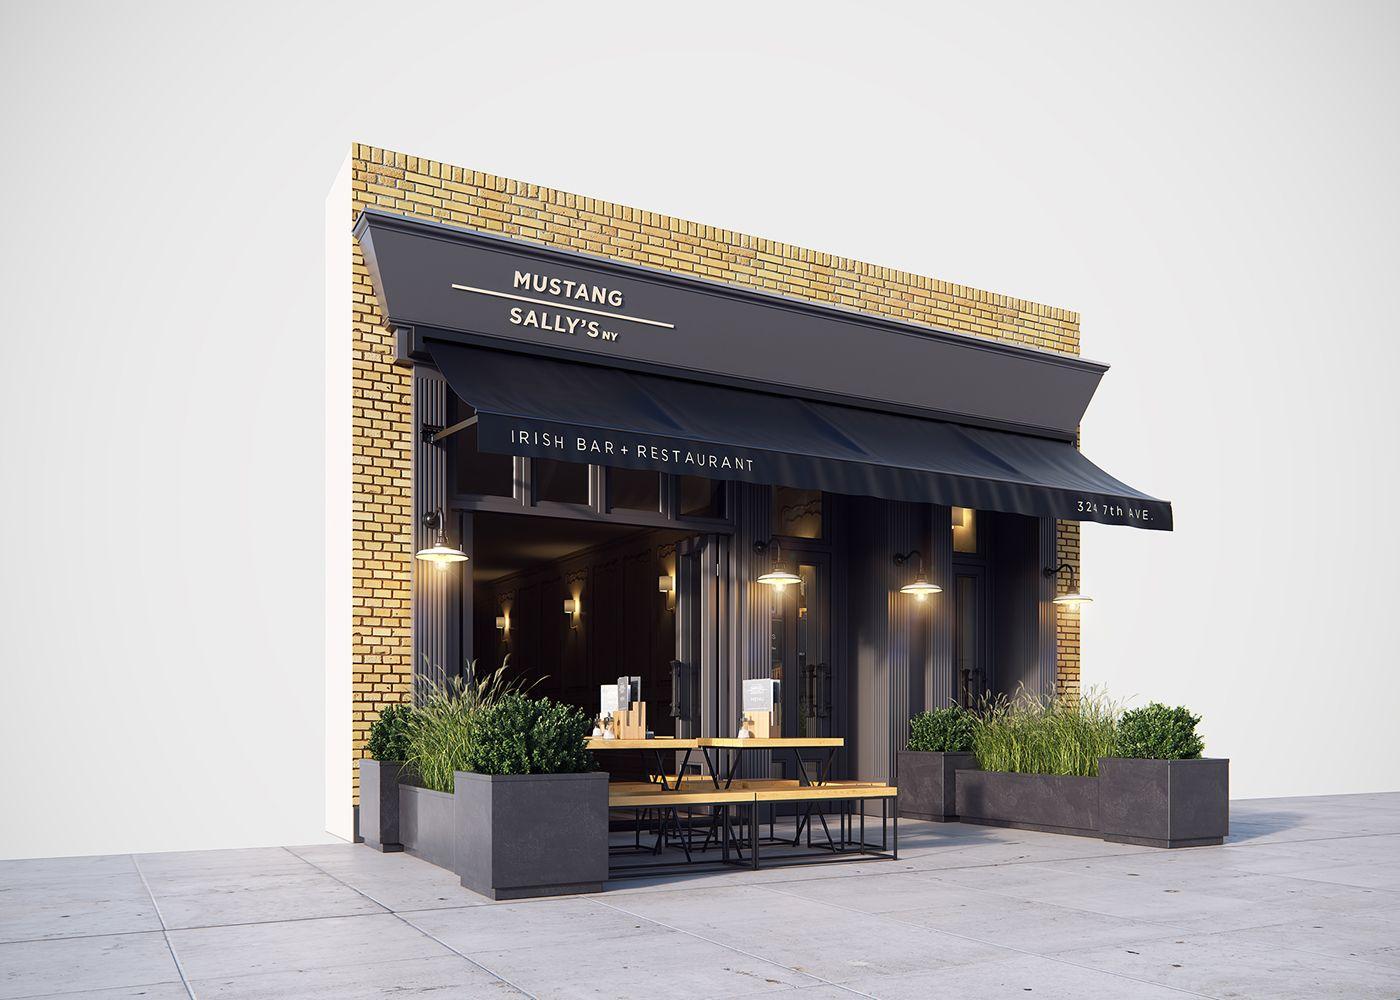 MUSTANG SALLY'S Irish bar + restaurant New York on Behance